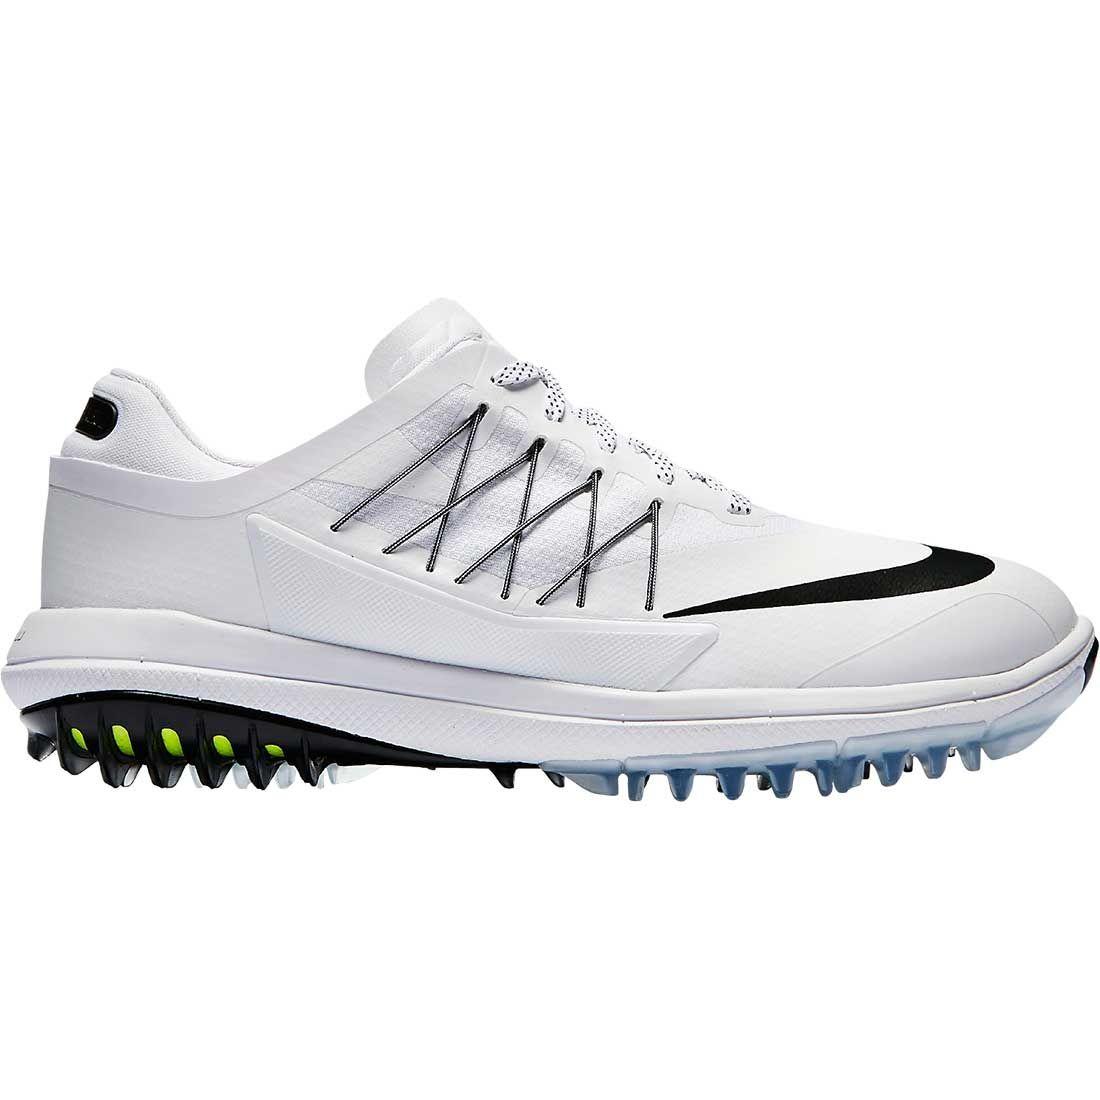 17++ Nike lunar golf shoes ideas information